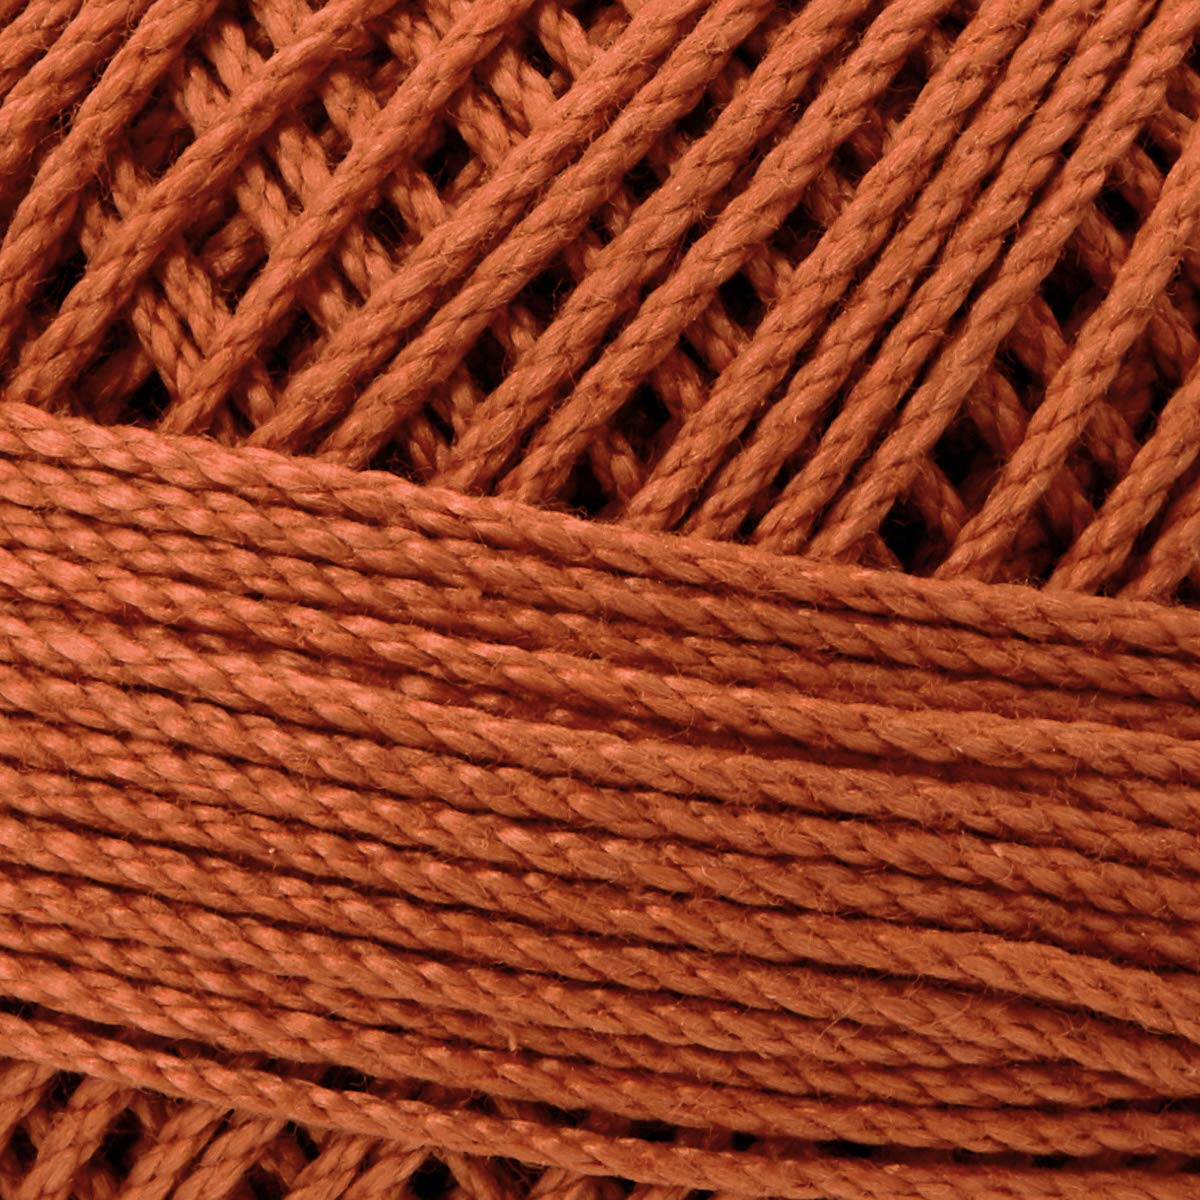 Tatting 50 Grams 120 Yards Raspberry Pink Med Knitting Thread Size 3 Handy Hands Lizbeth Egyptian Cotton Crochet HH03624